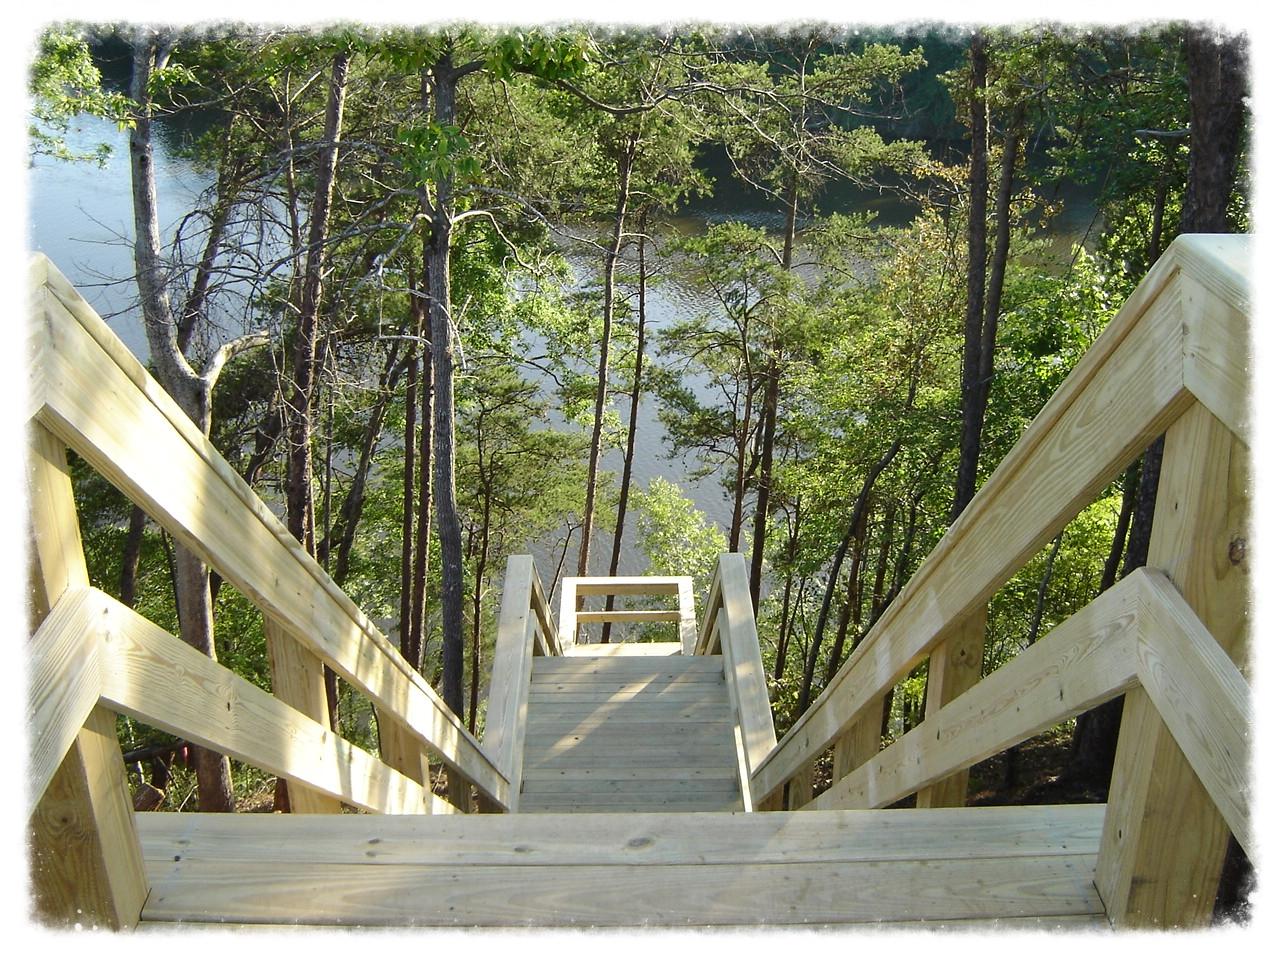 Lake Access Handrail